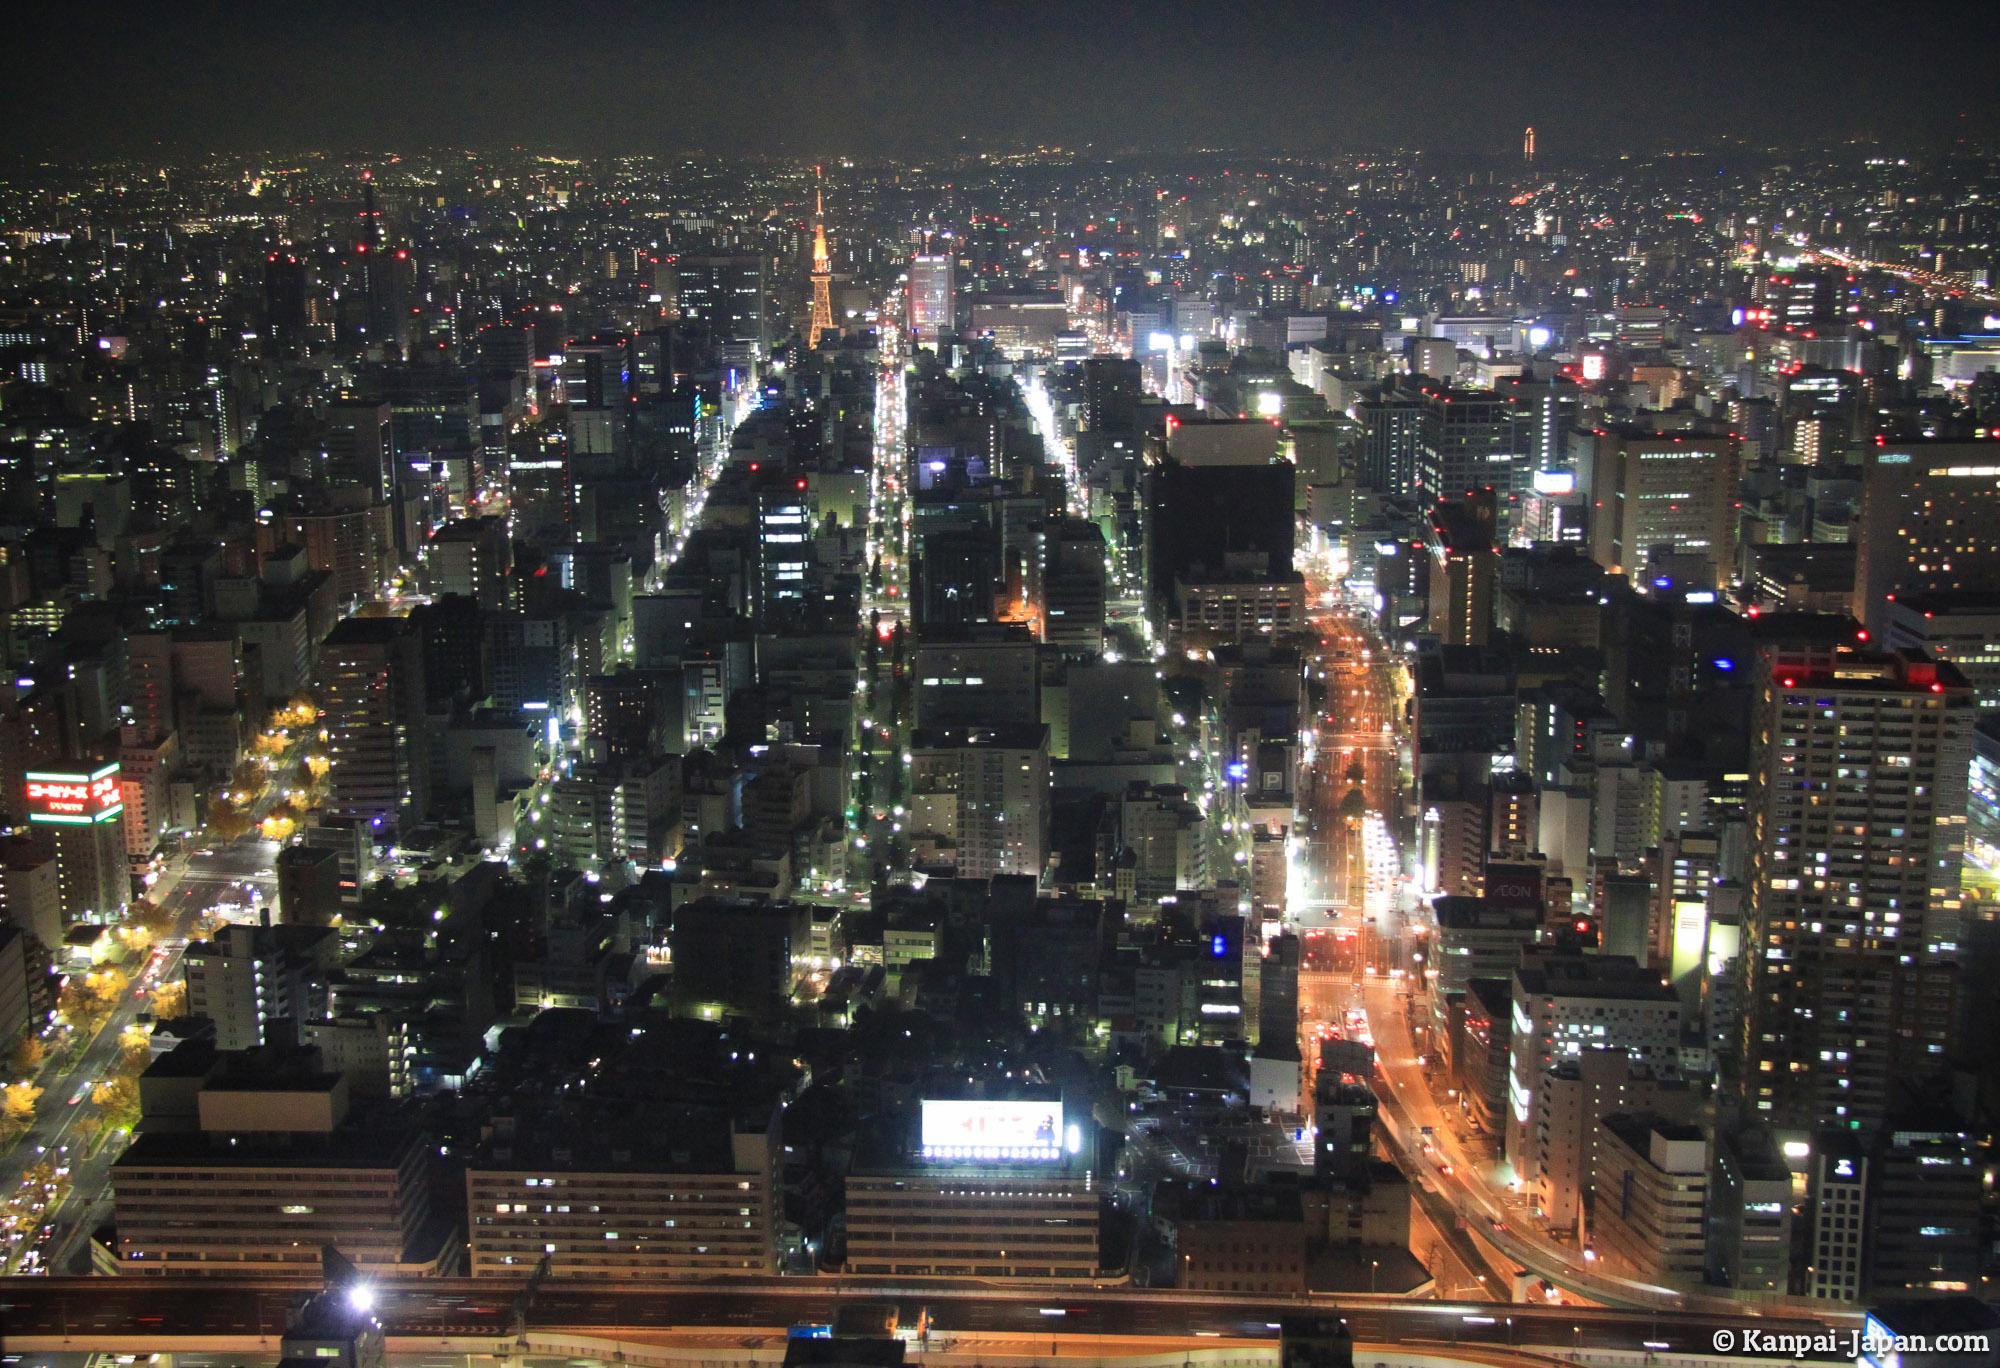 Sakae The Downtown Nagoya District With Oasis 21